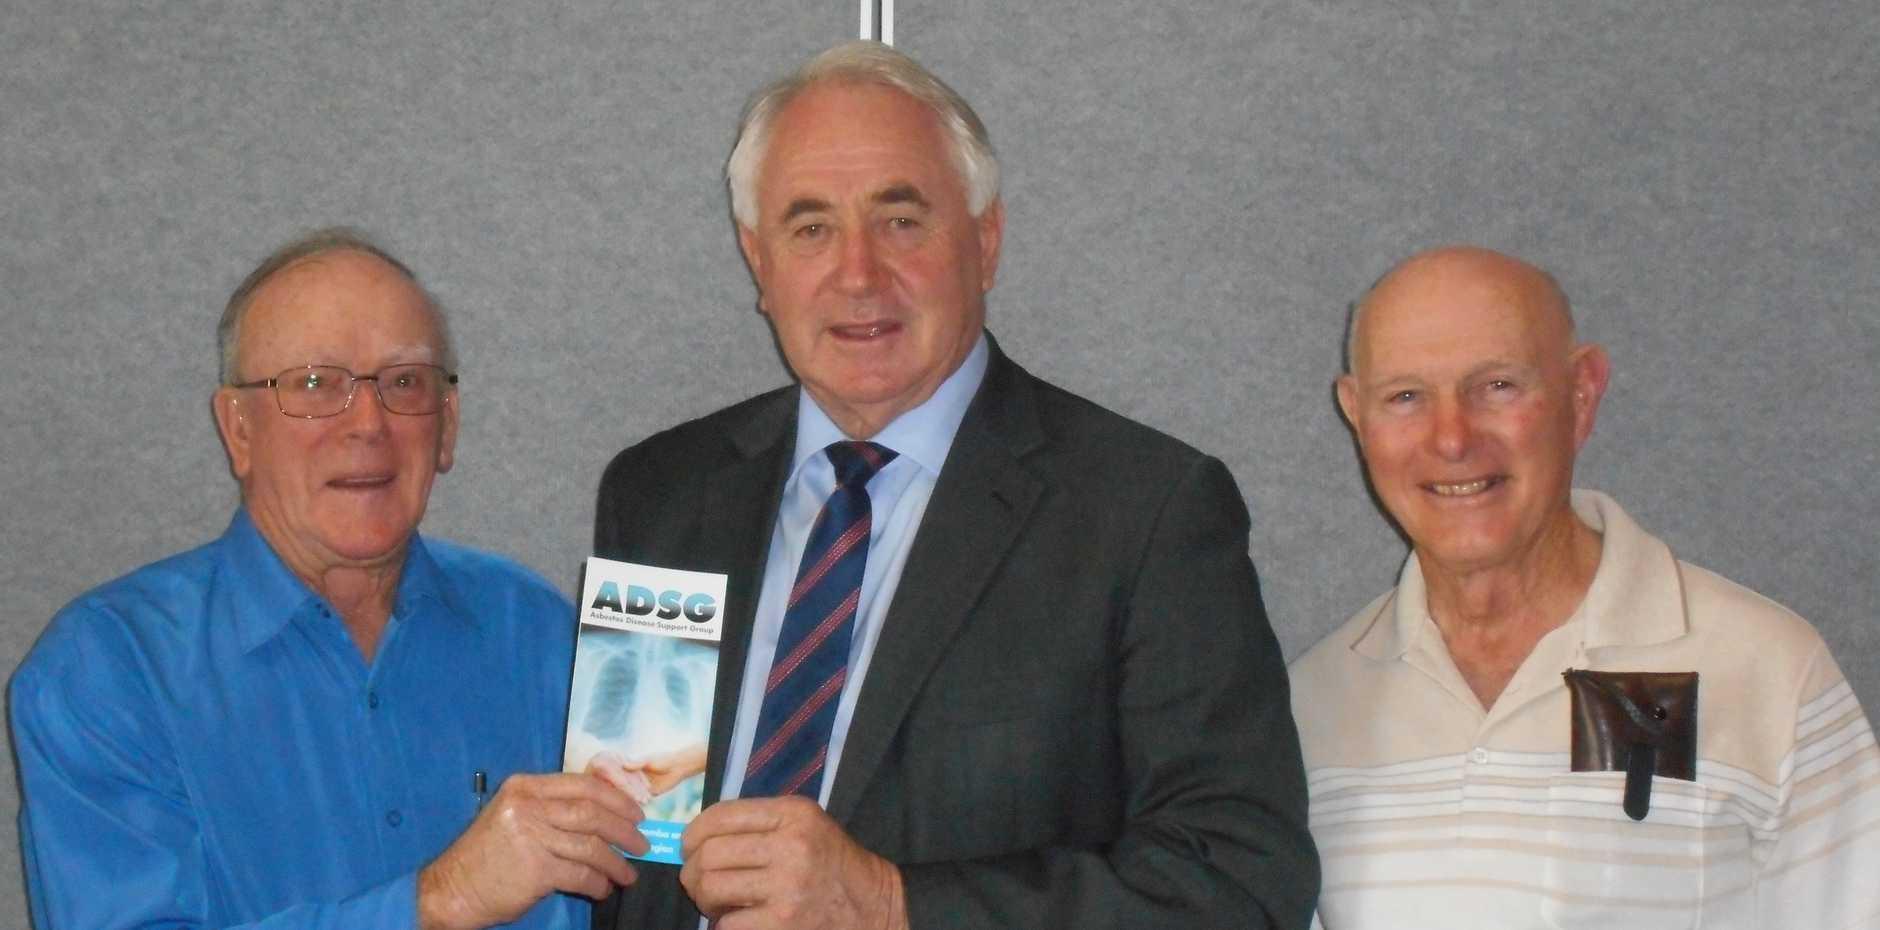 Left to Right:  Ted Williams, President ADSG, Paul Antonio, Toowoomba Regional Mayor, Wayne Bryan